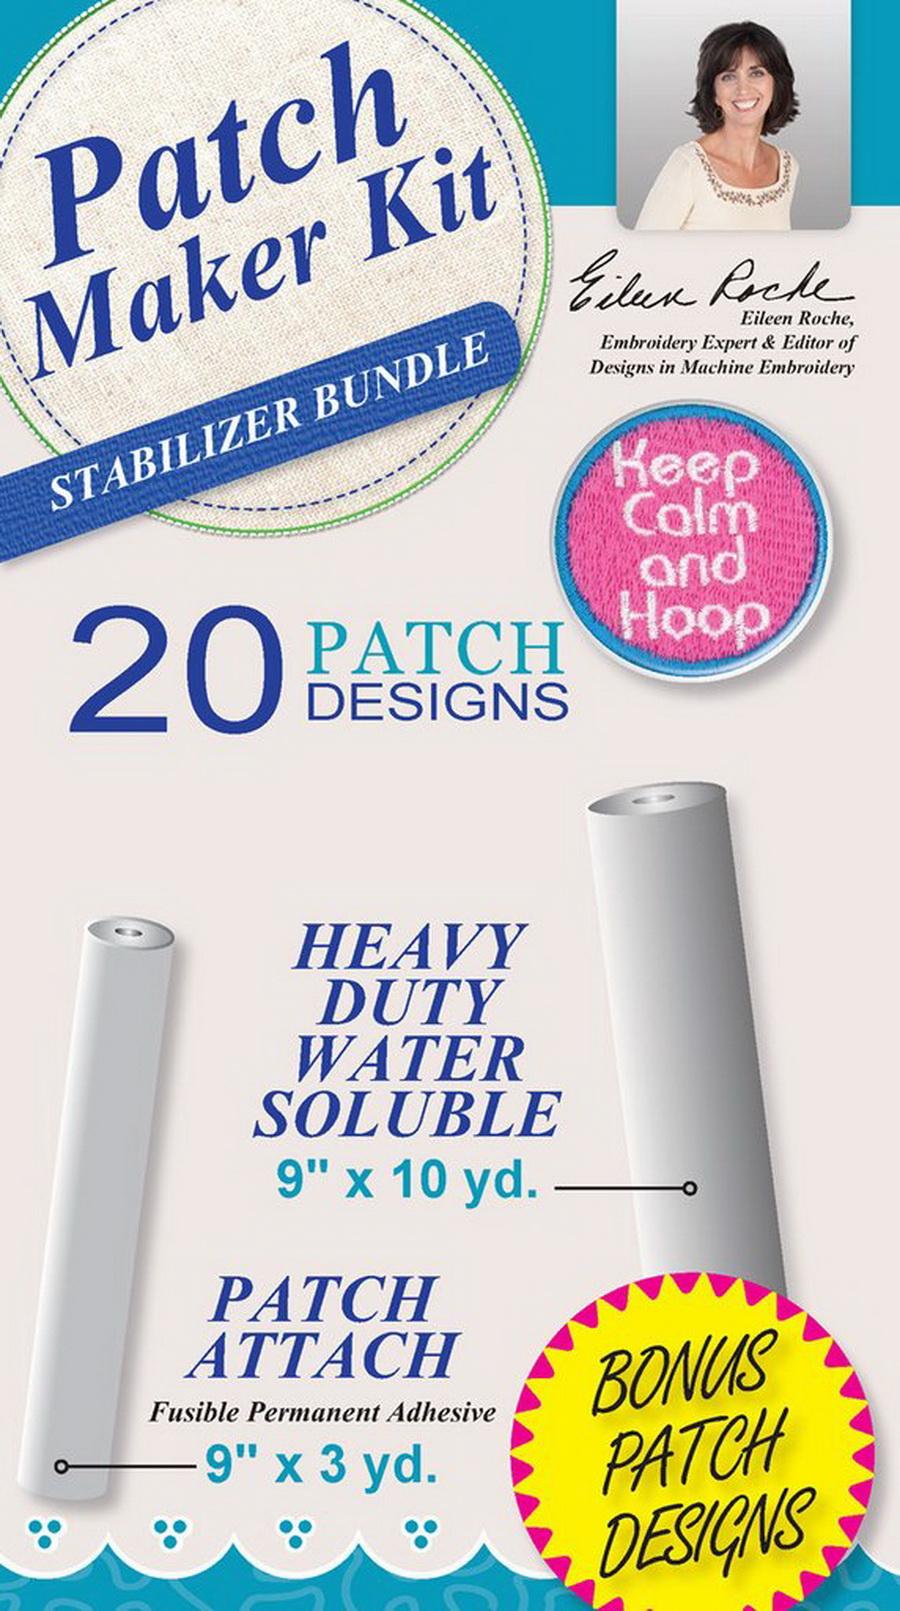 DIME - Patch Maker Kit Stabilizer Bundle